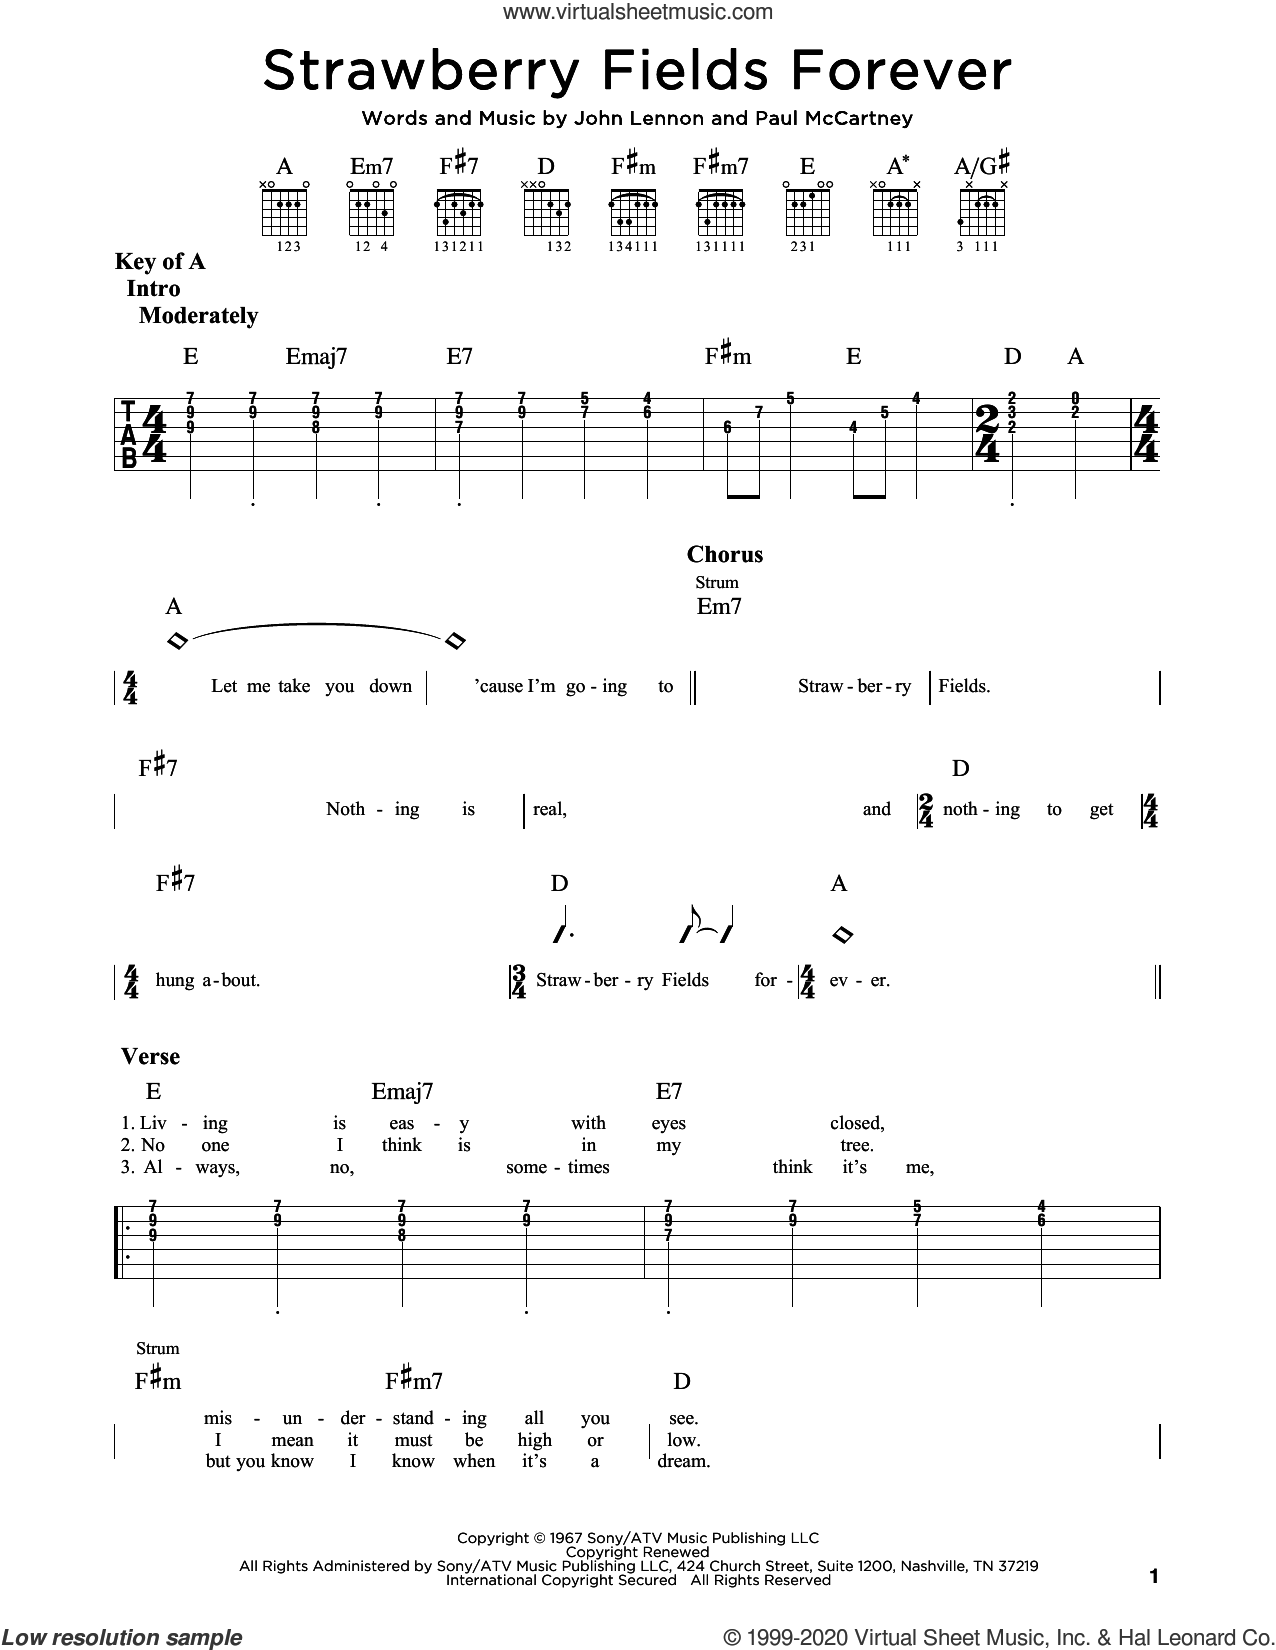 Strawberry Fields Forever sheet music for guitar (rhythm tablature) by The Beatles, John Lennon and Paul McCartney, intermediate skill level